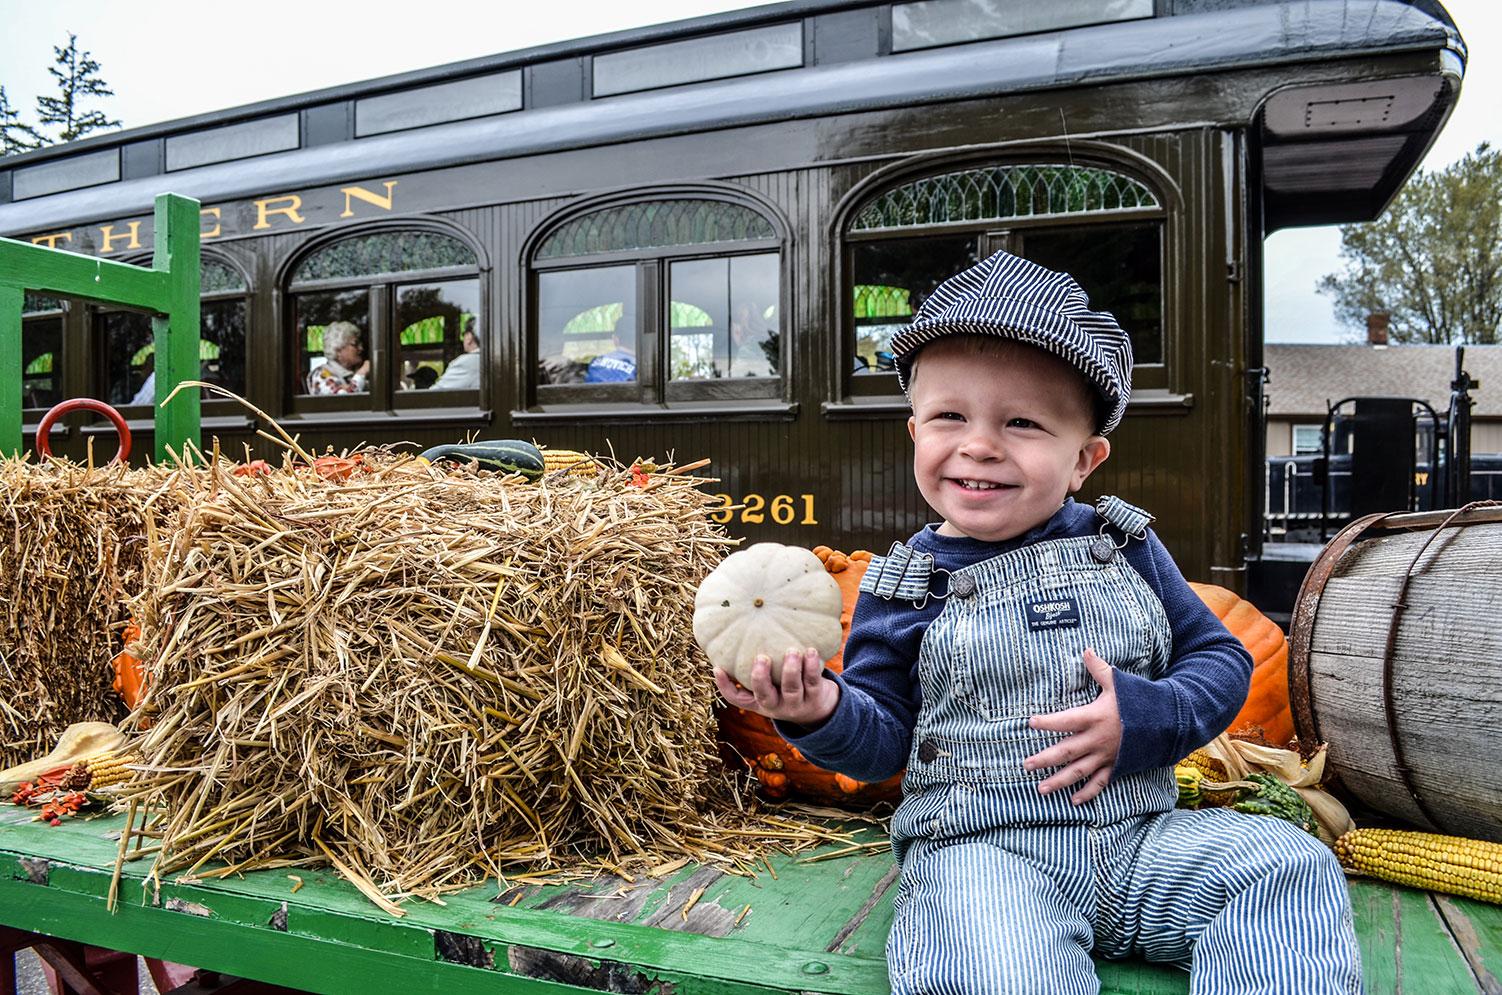 Child in engineer uniform holding gourd next to railroad passenger car